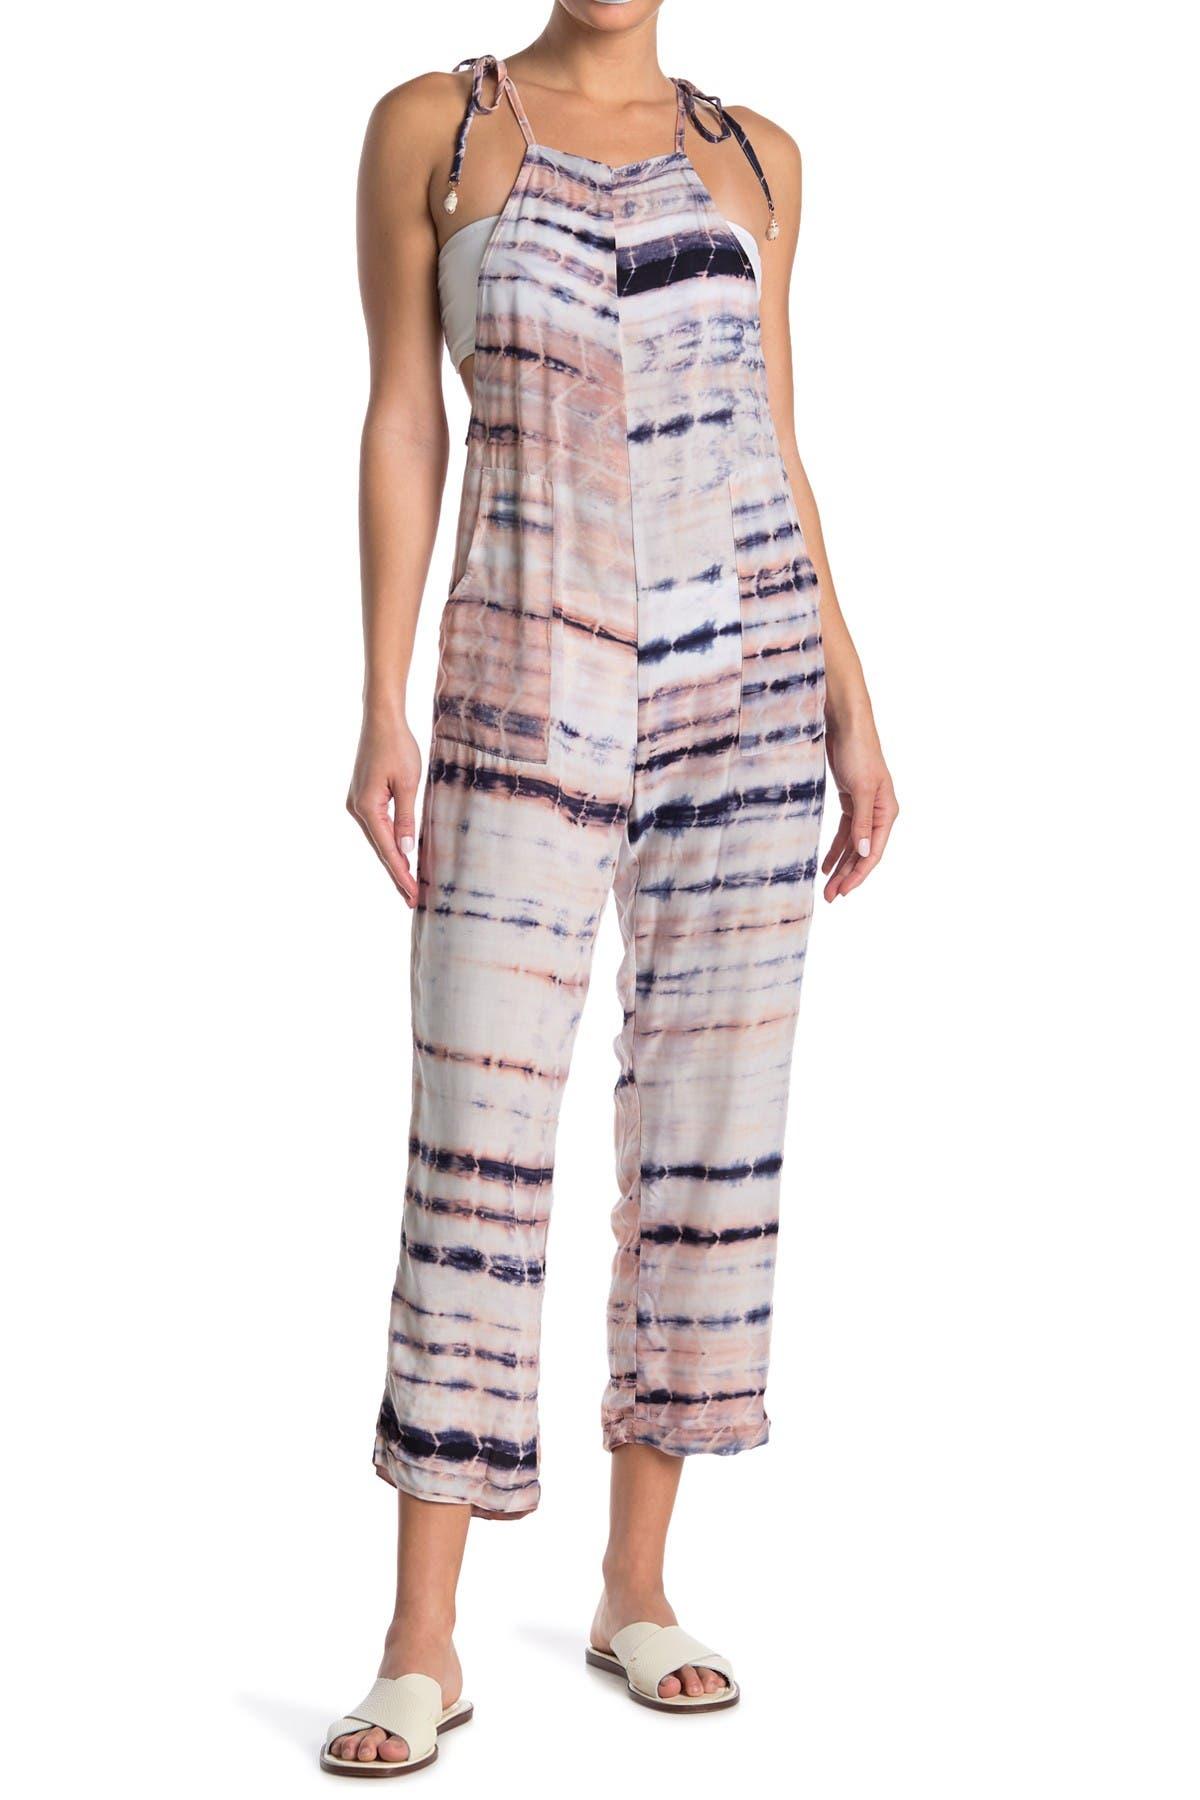 Image of isabella rose Tie Dye Jumpsuit